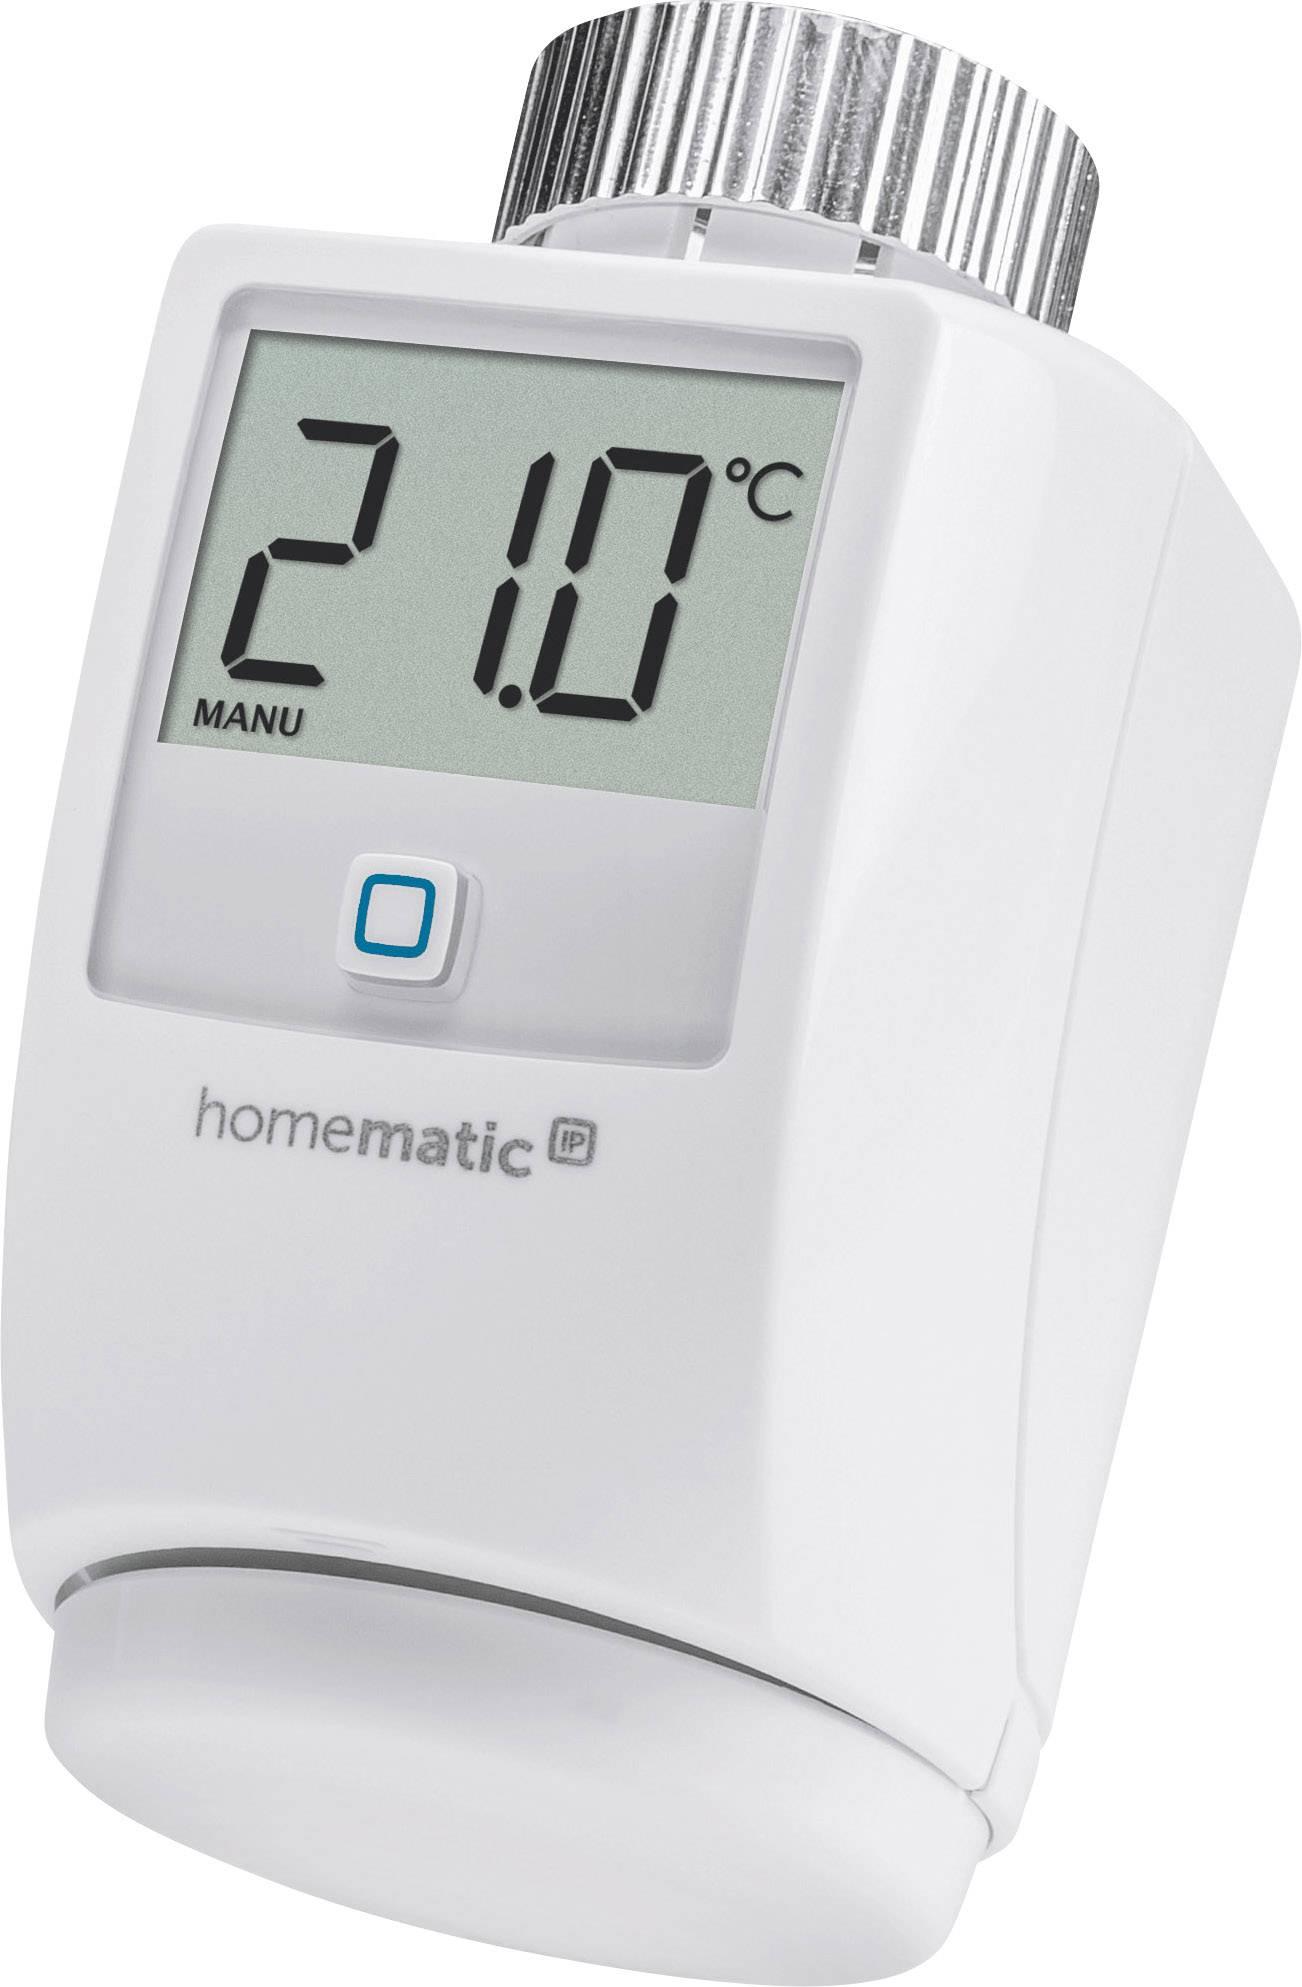 Bezdrátová termostatická hlavice na radiátor Homematic IP HMIP-eTRV-2